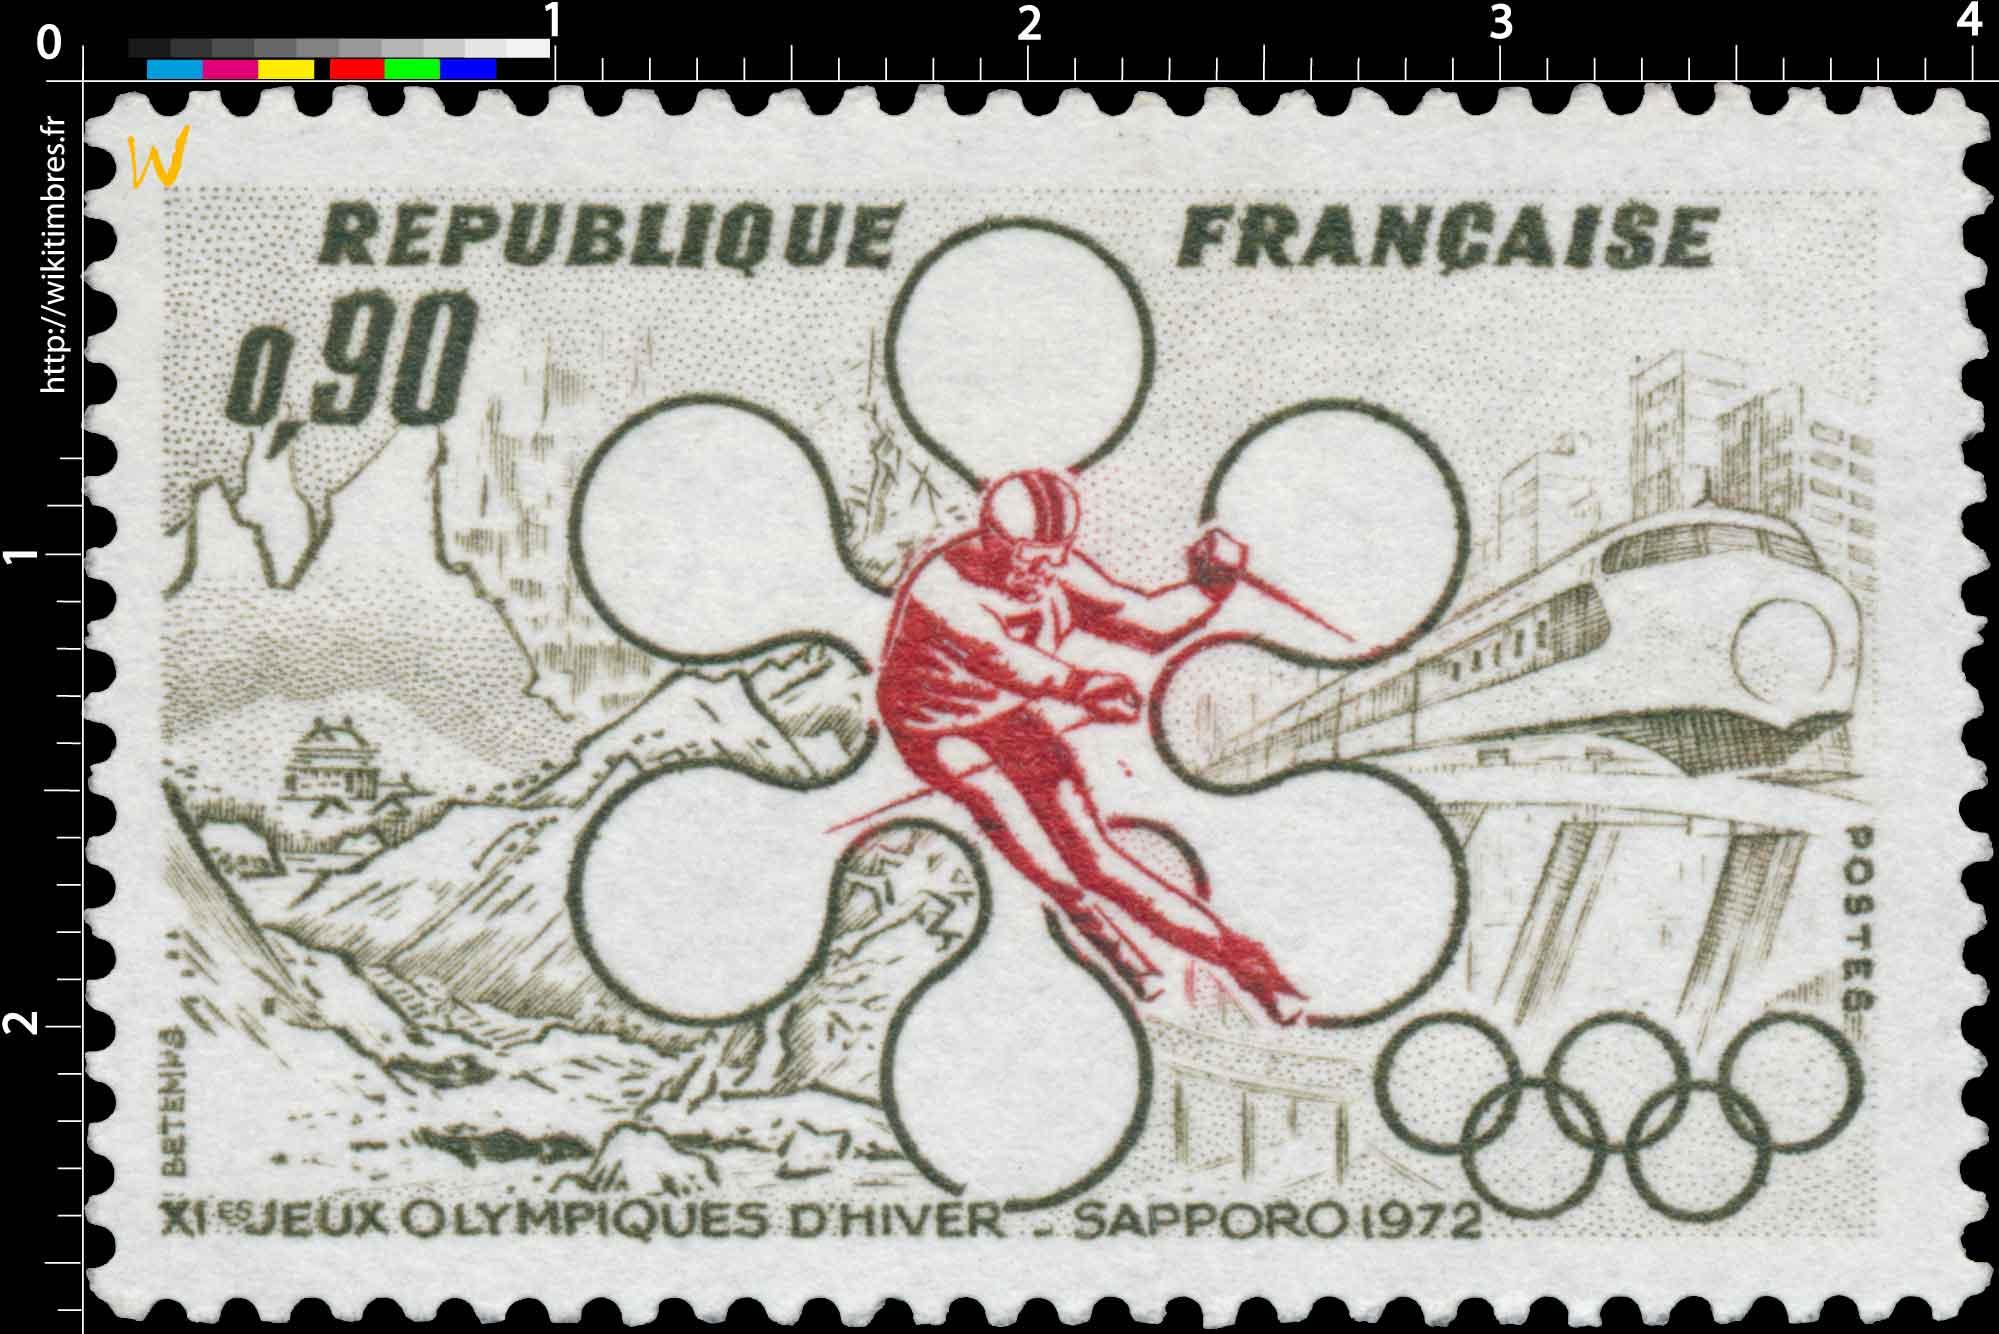 XIe JEUX OLYMPIQUES D'HIVER - SAPPORO 1972